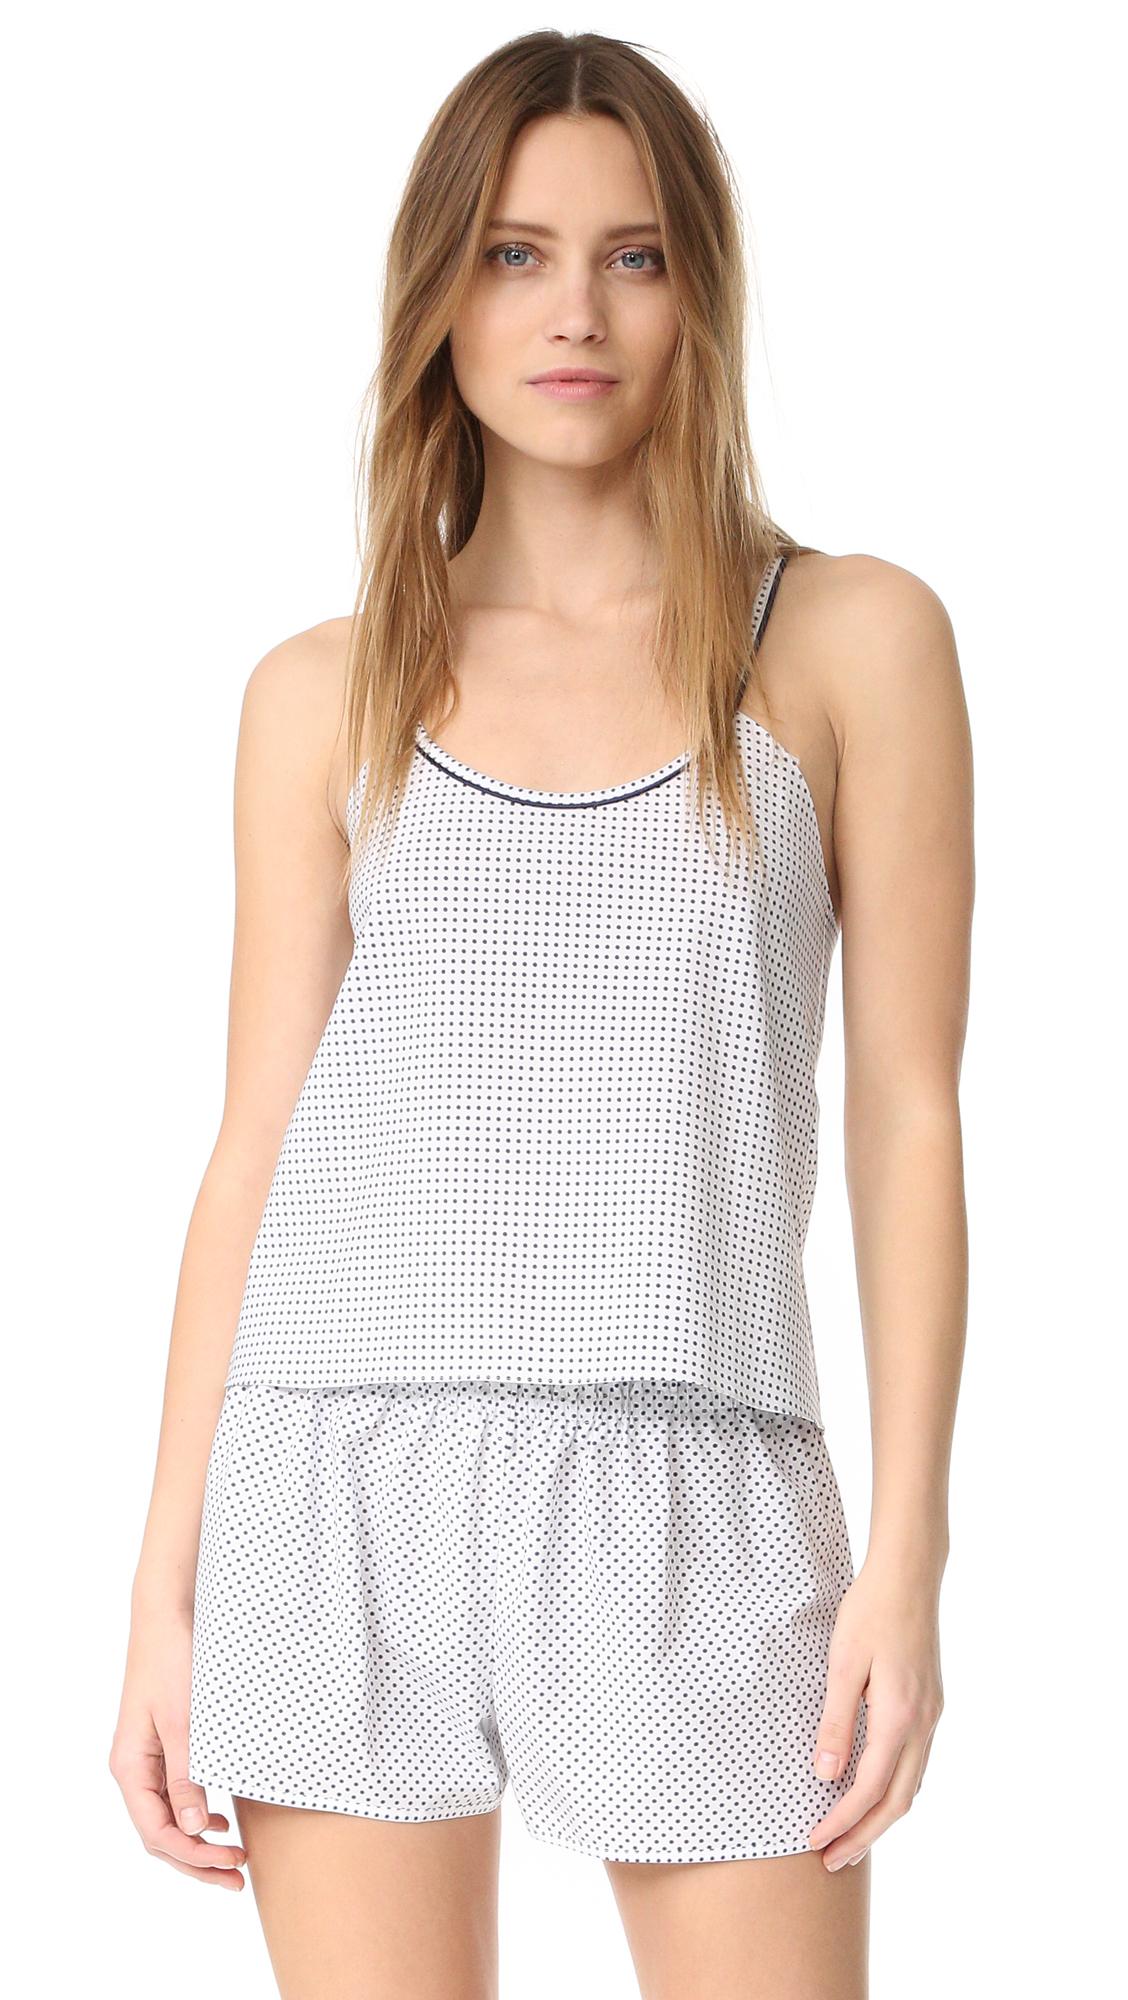 Alessandra Mackenzie Chelsea Camisole - White/Navy Dot at Shopbop